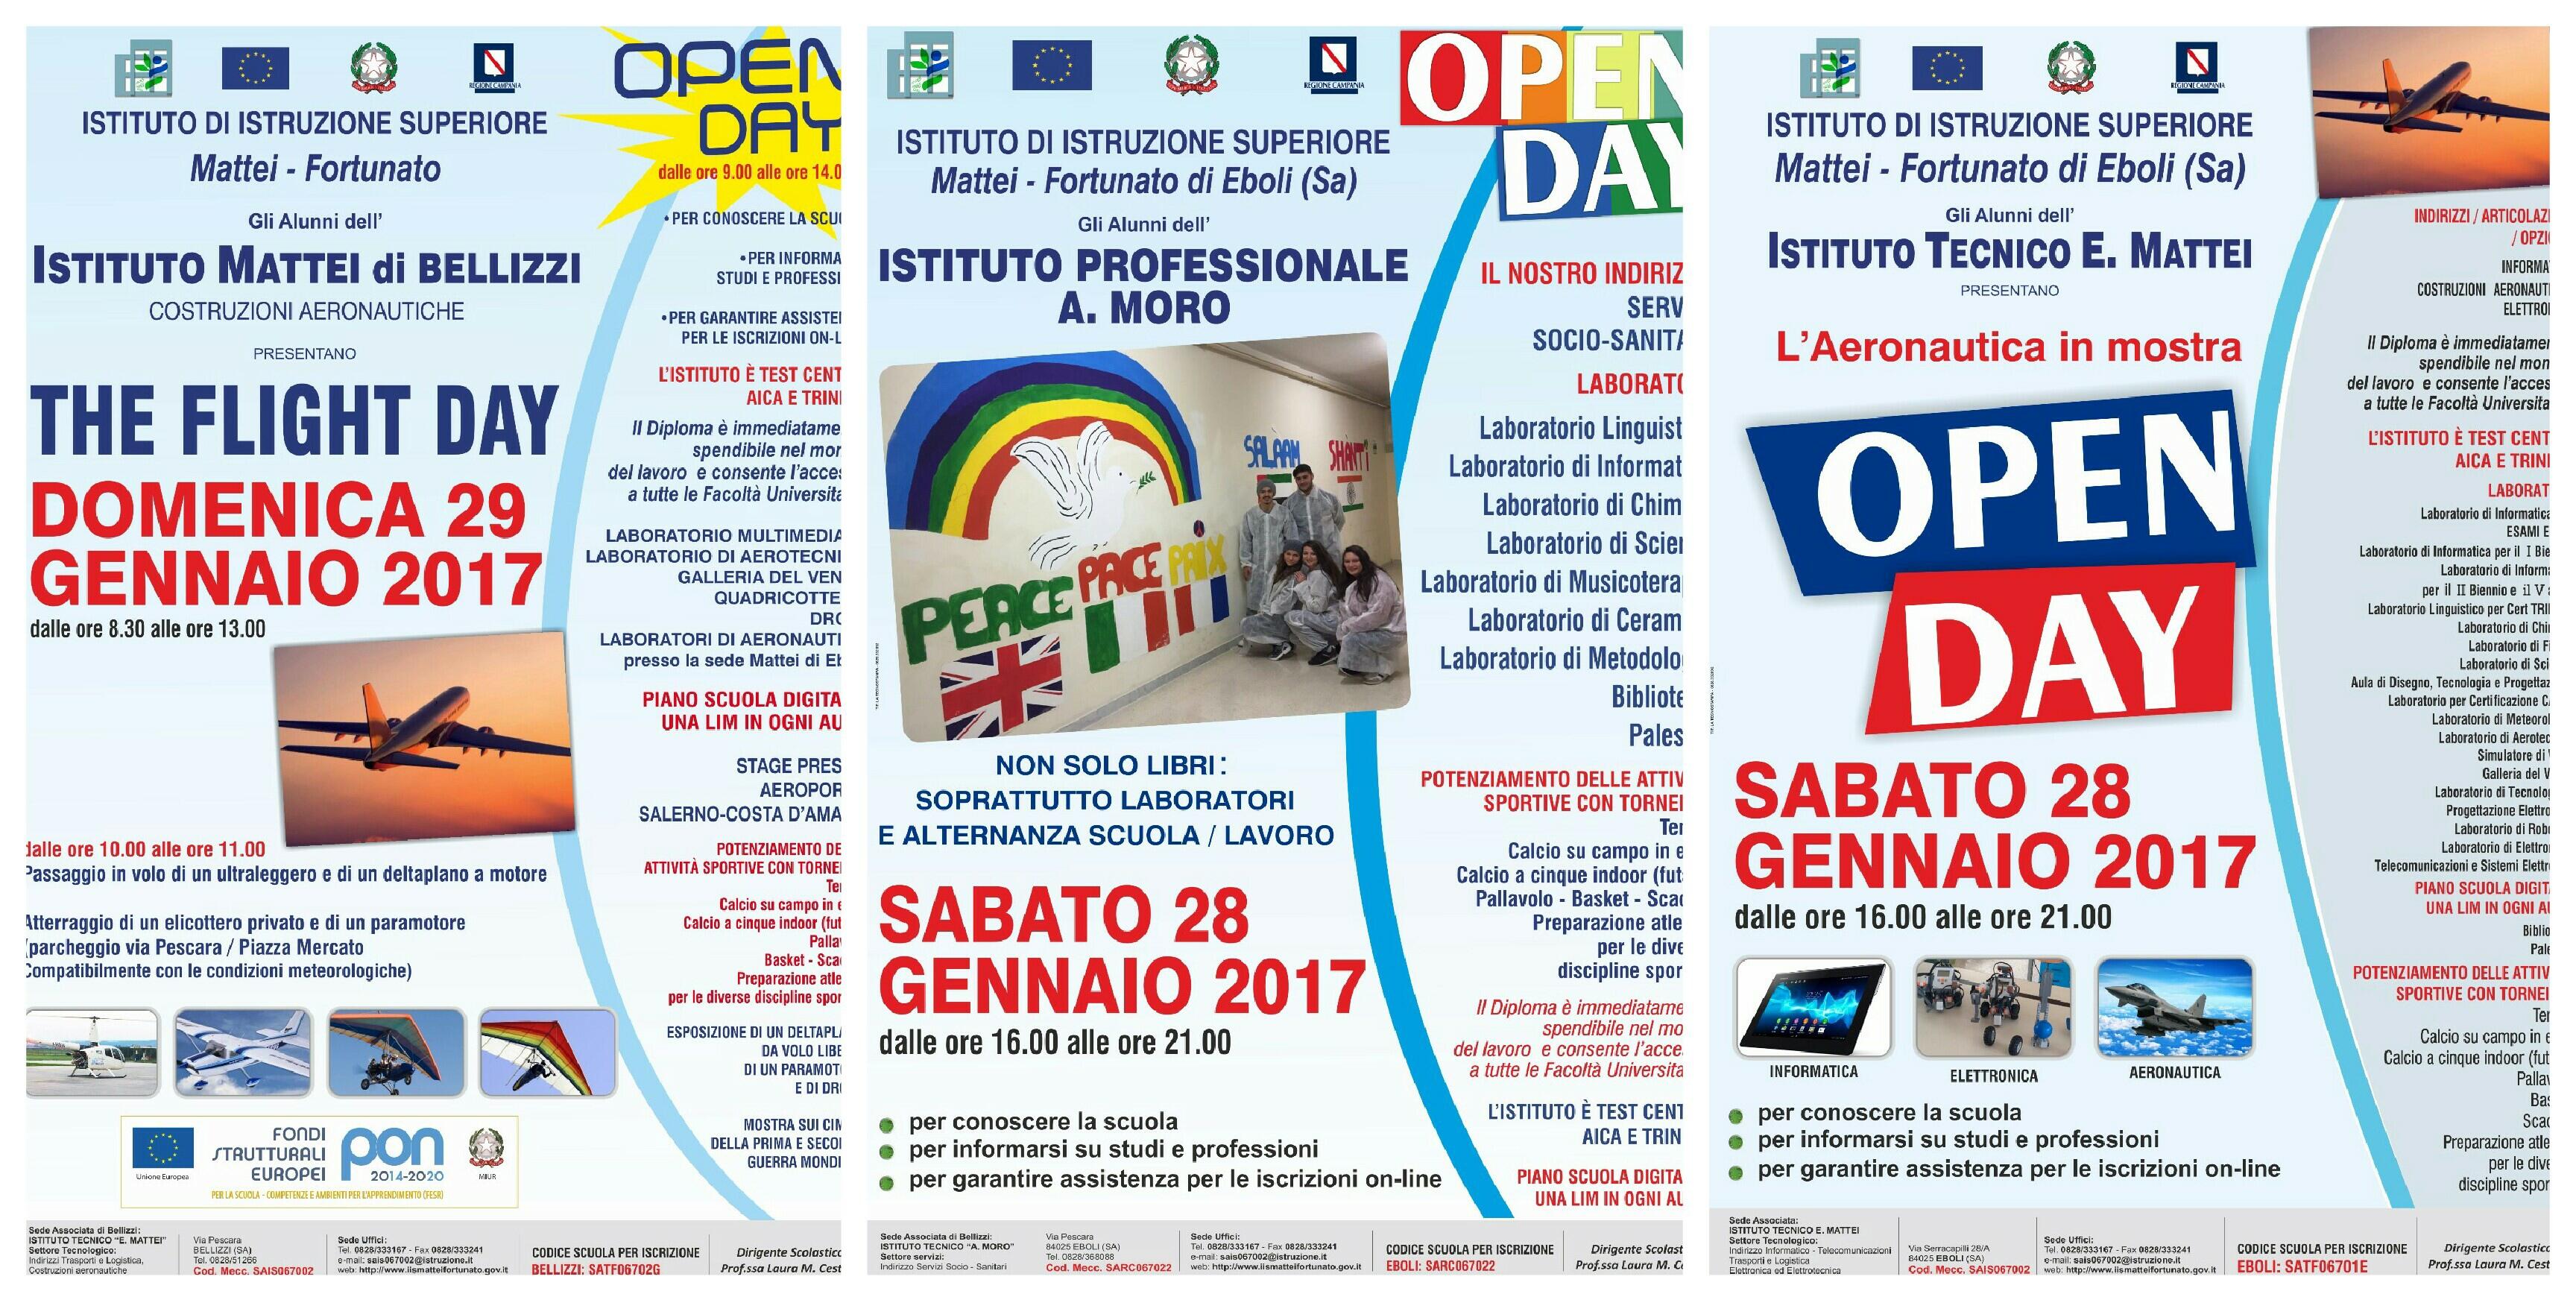 Open Day-mattei-Moro-Eboli-Bellizzi